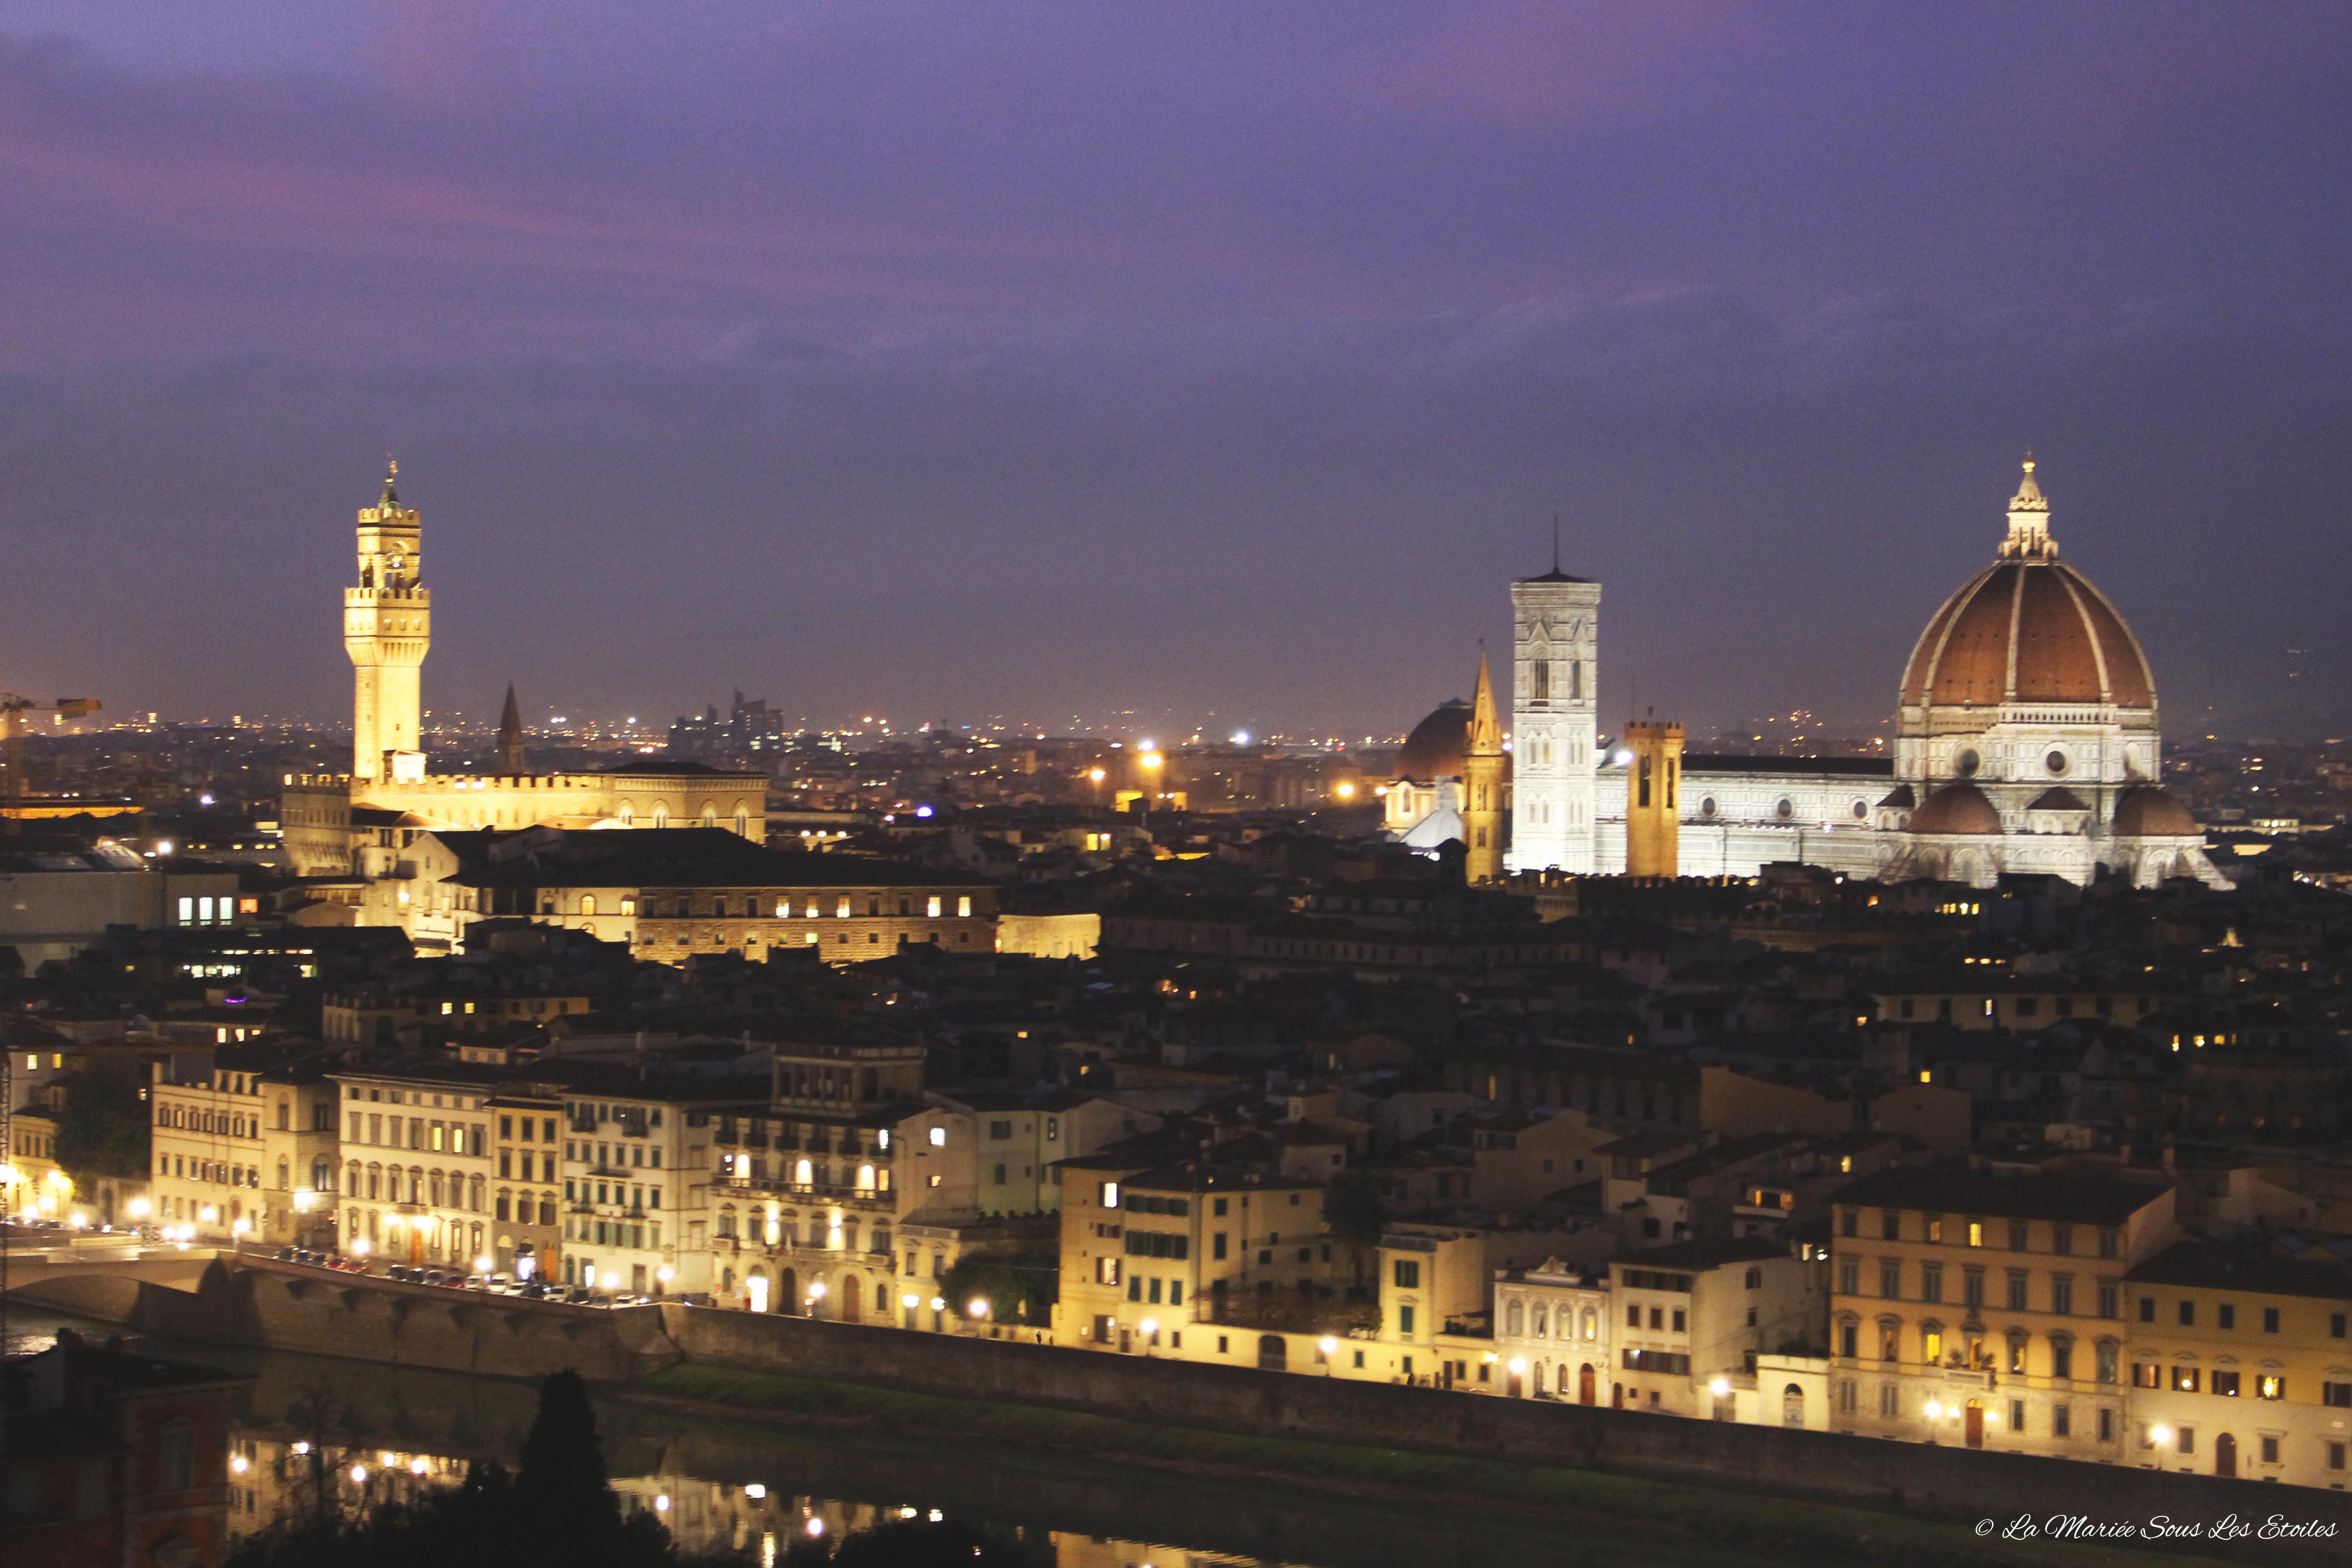 Vue nocturne sur Firenze | Voyage en amoureux - Florence